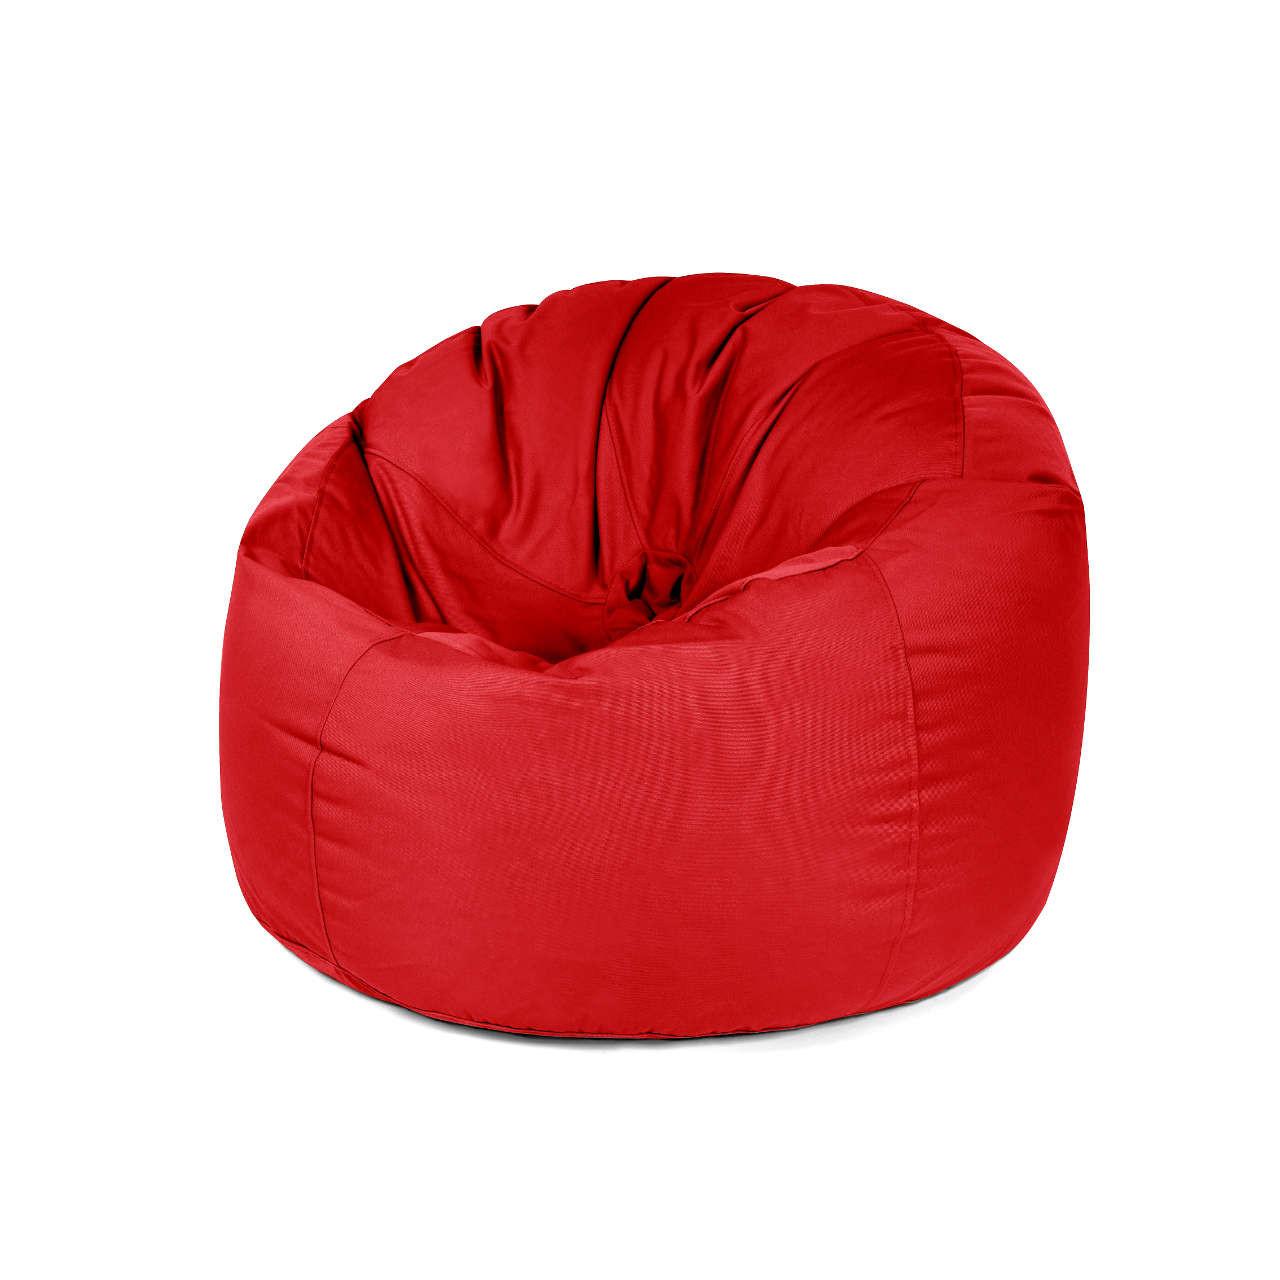 Outbag Sitzsack Donut plus red